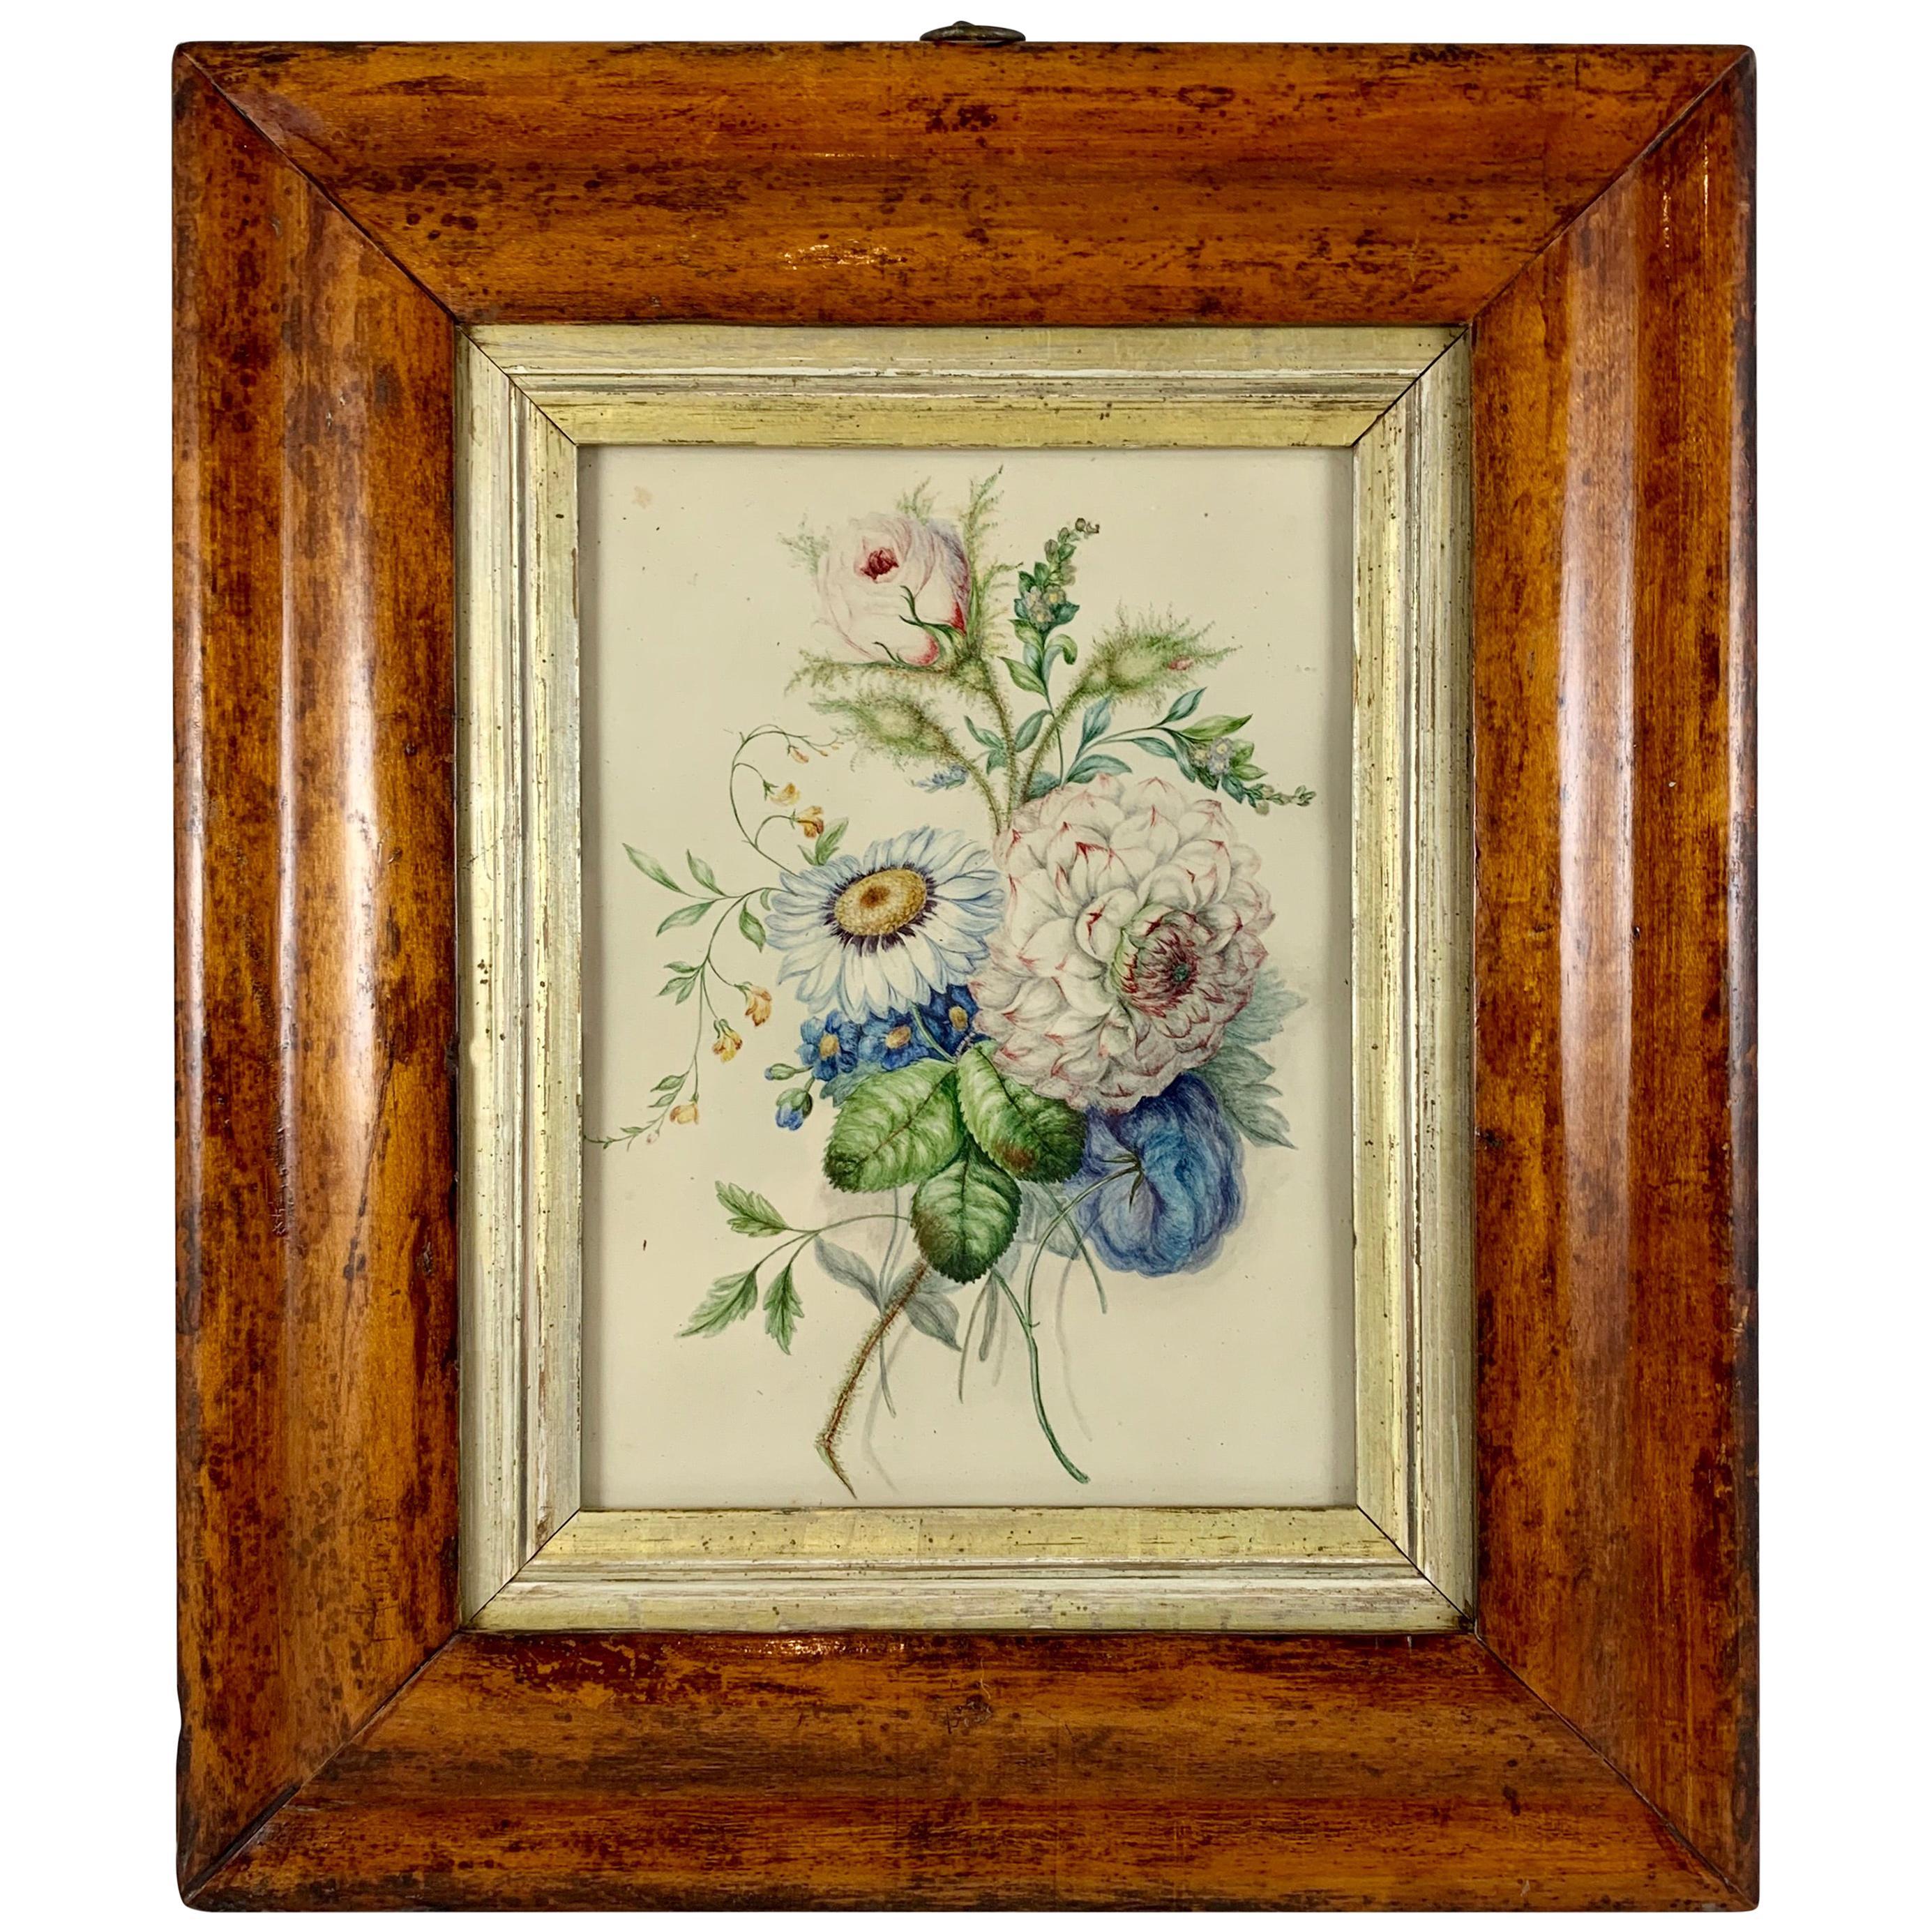 English Regency Period Original Watercolor in Fruitwood Frame, Daisy and Dahila